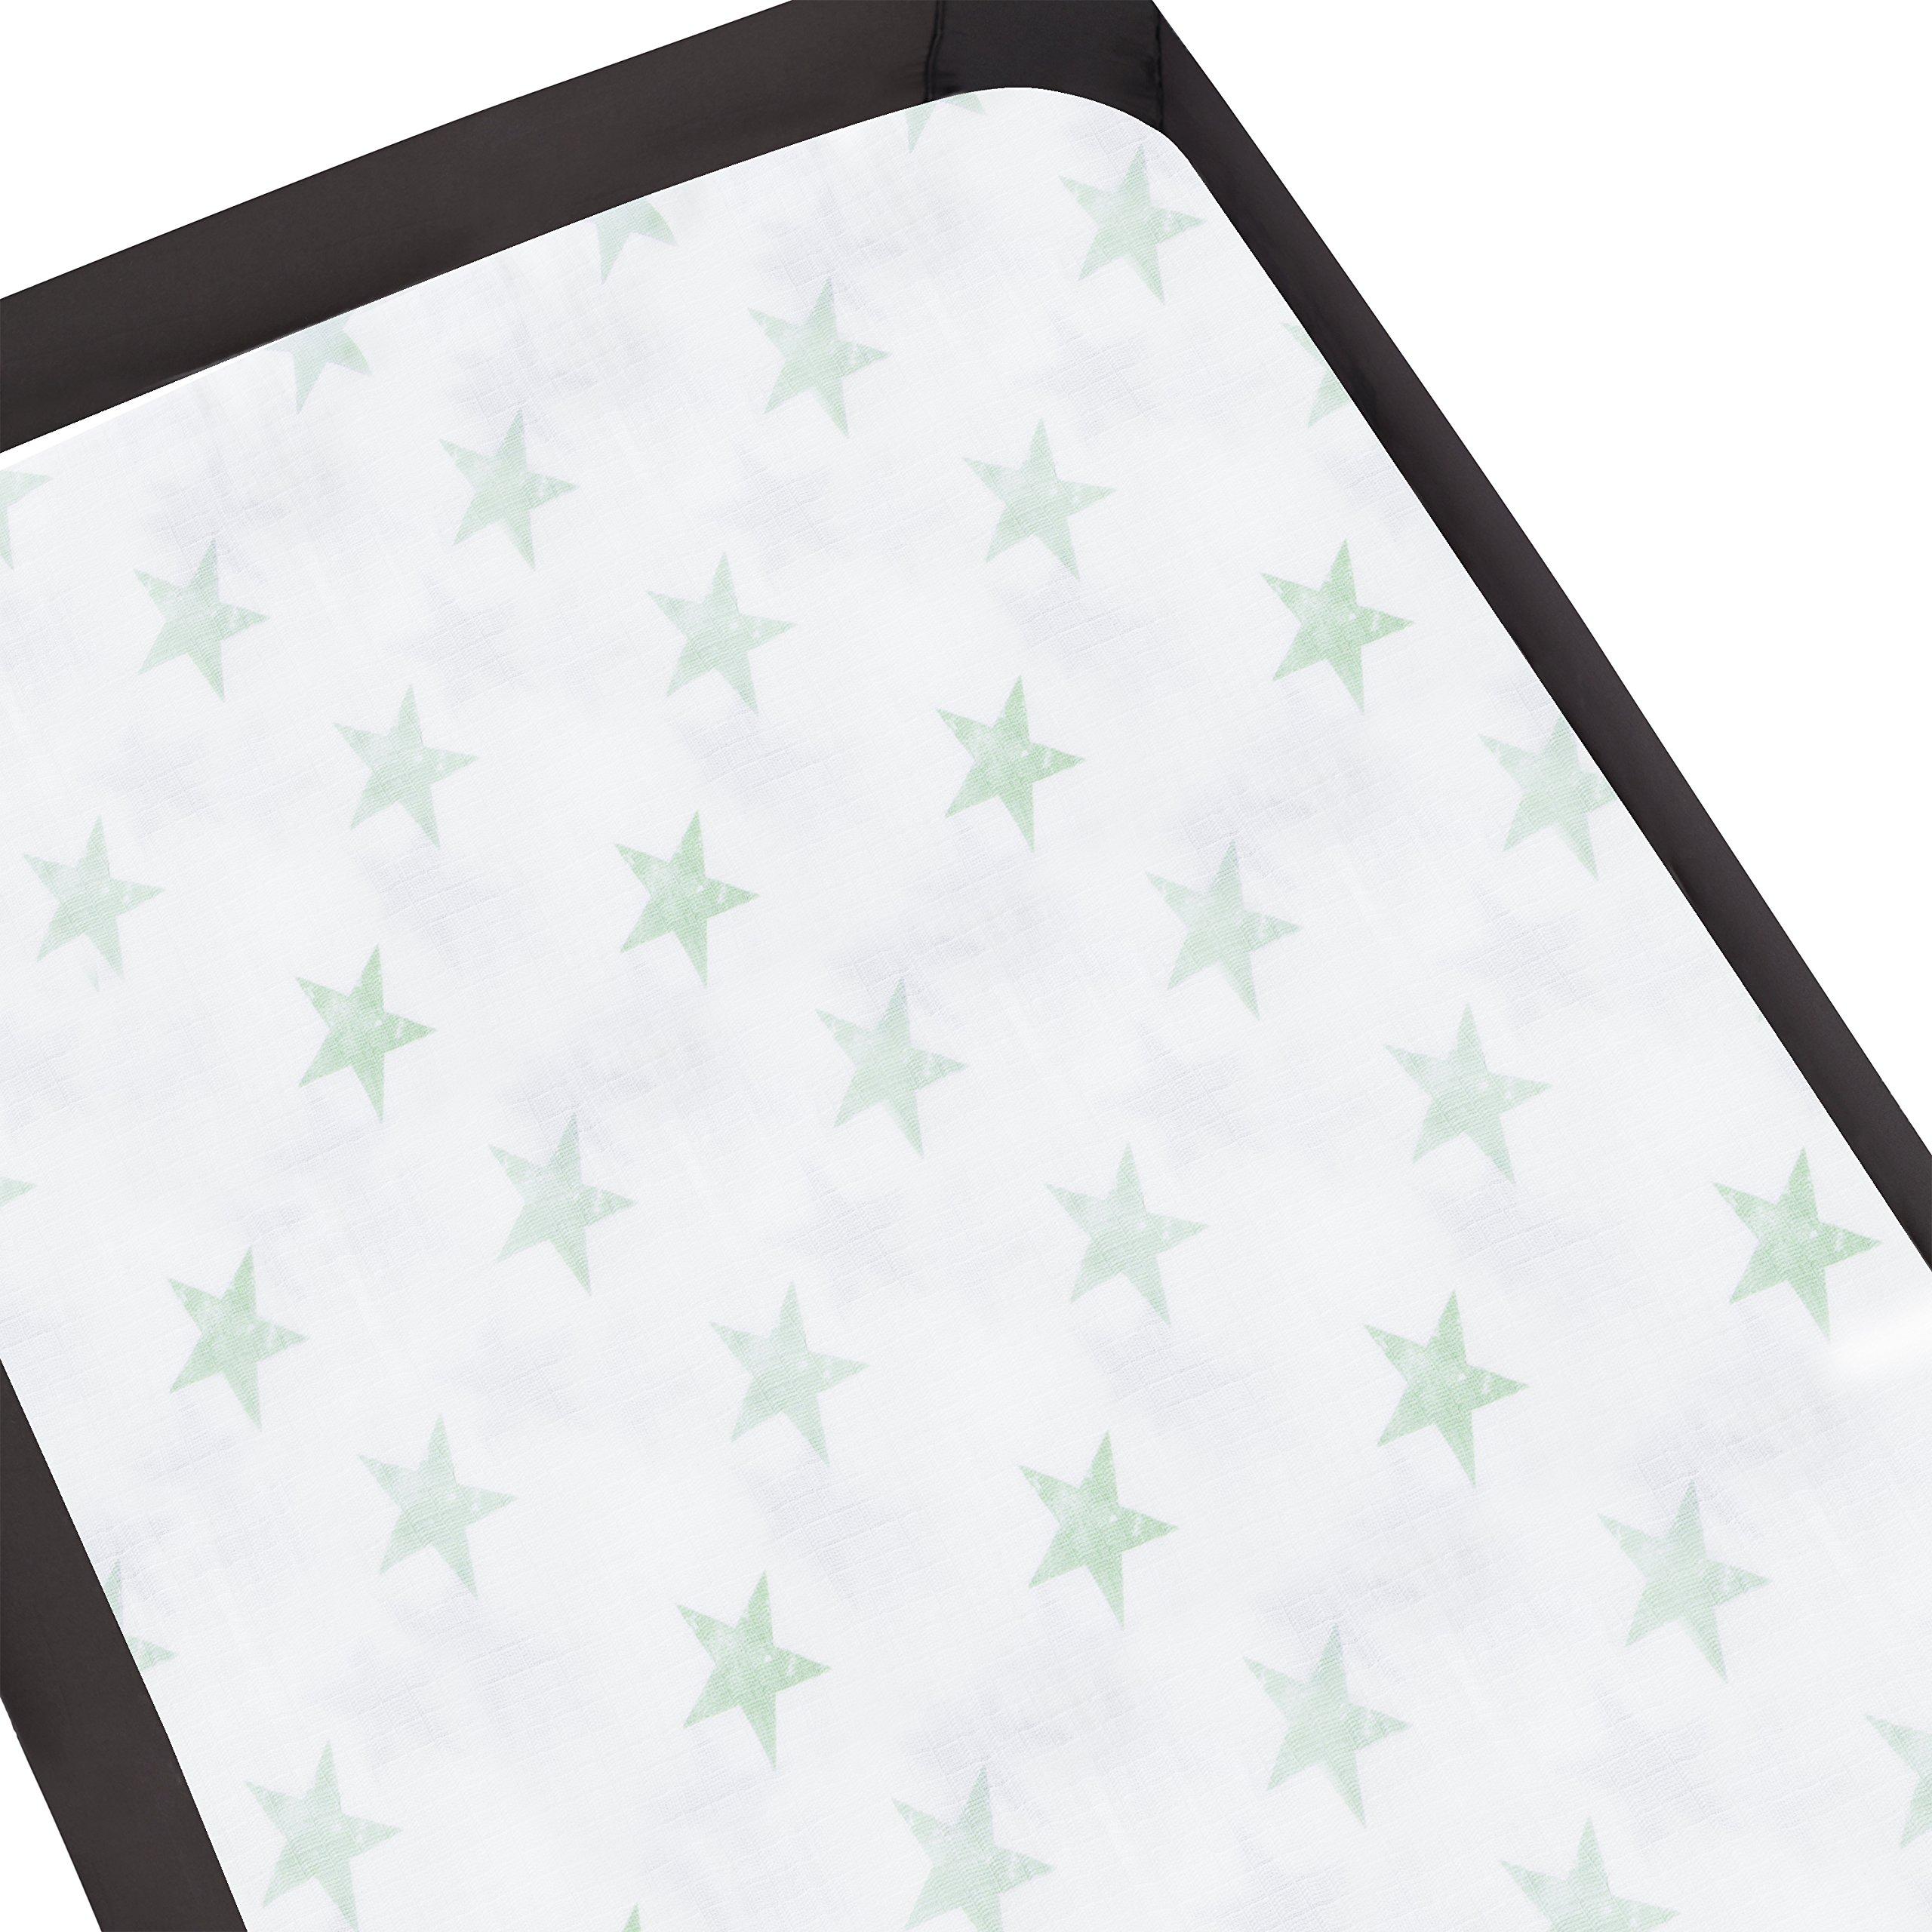 aden by aden + anais Pack 'n Play Playard Crib Sheet, 100% Cotton Muslin, Super Soft, Breathable, Snug Fit Dream - Stars